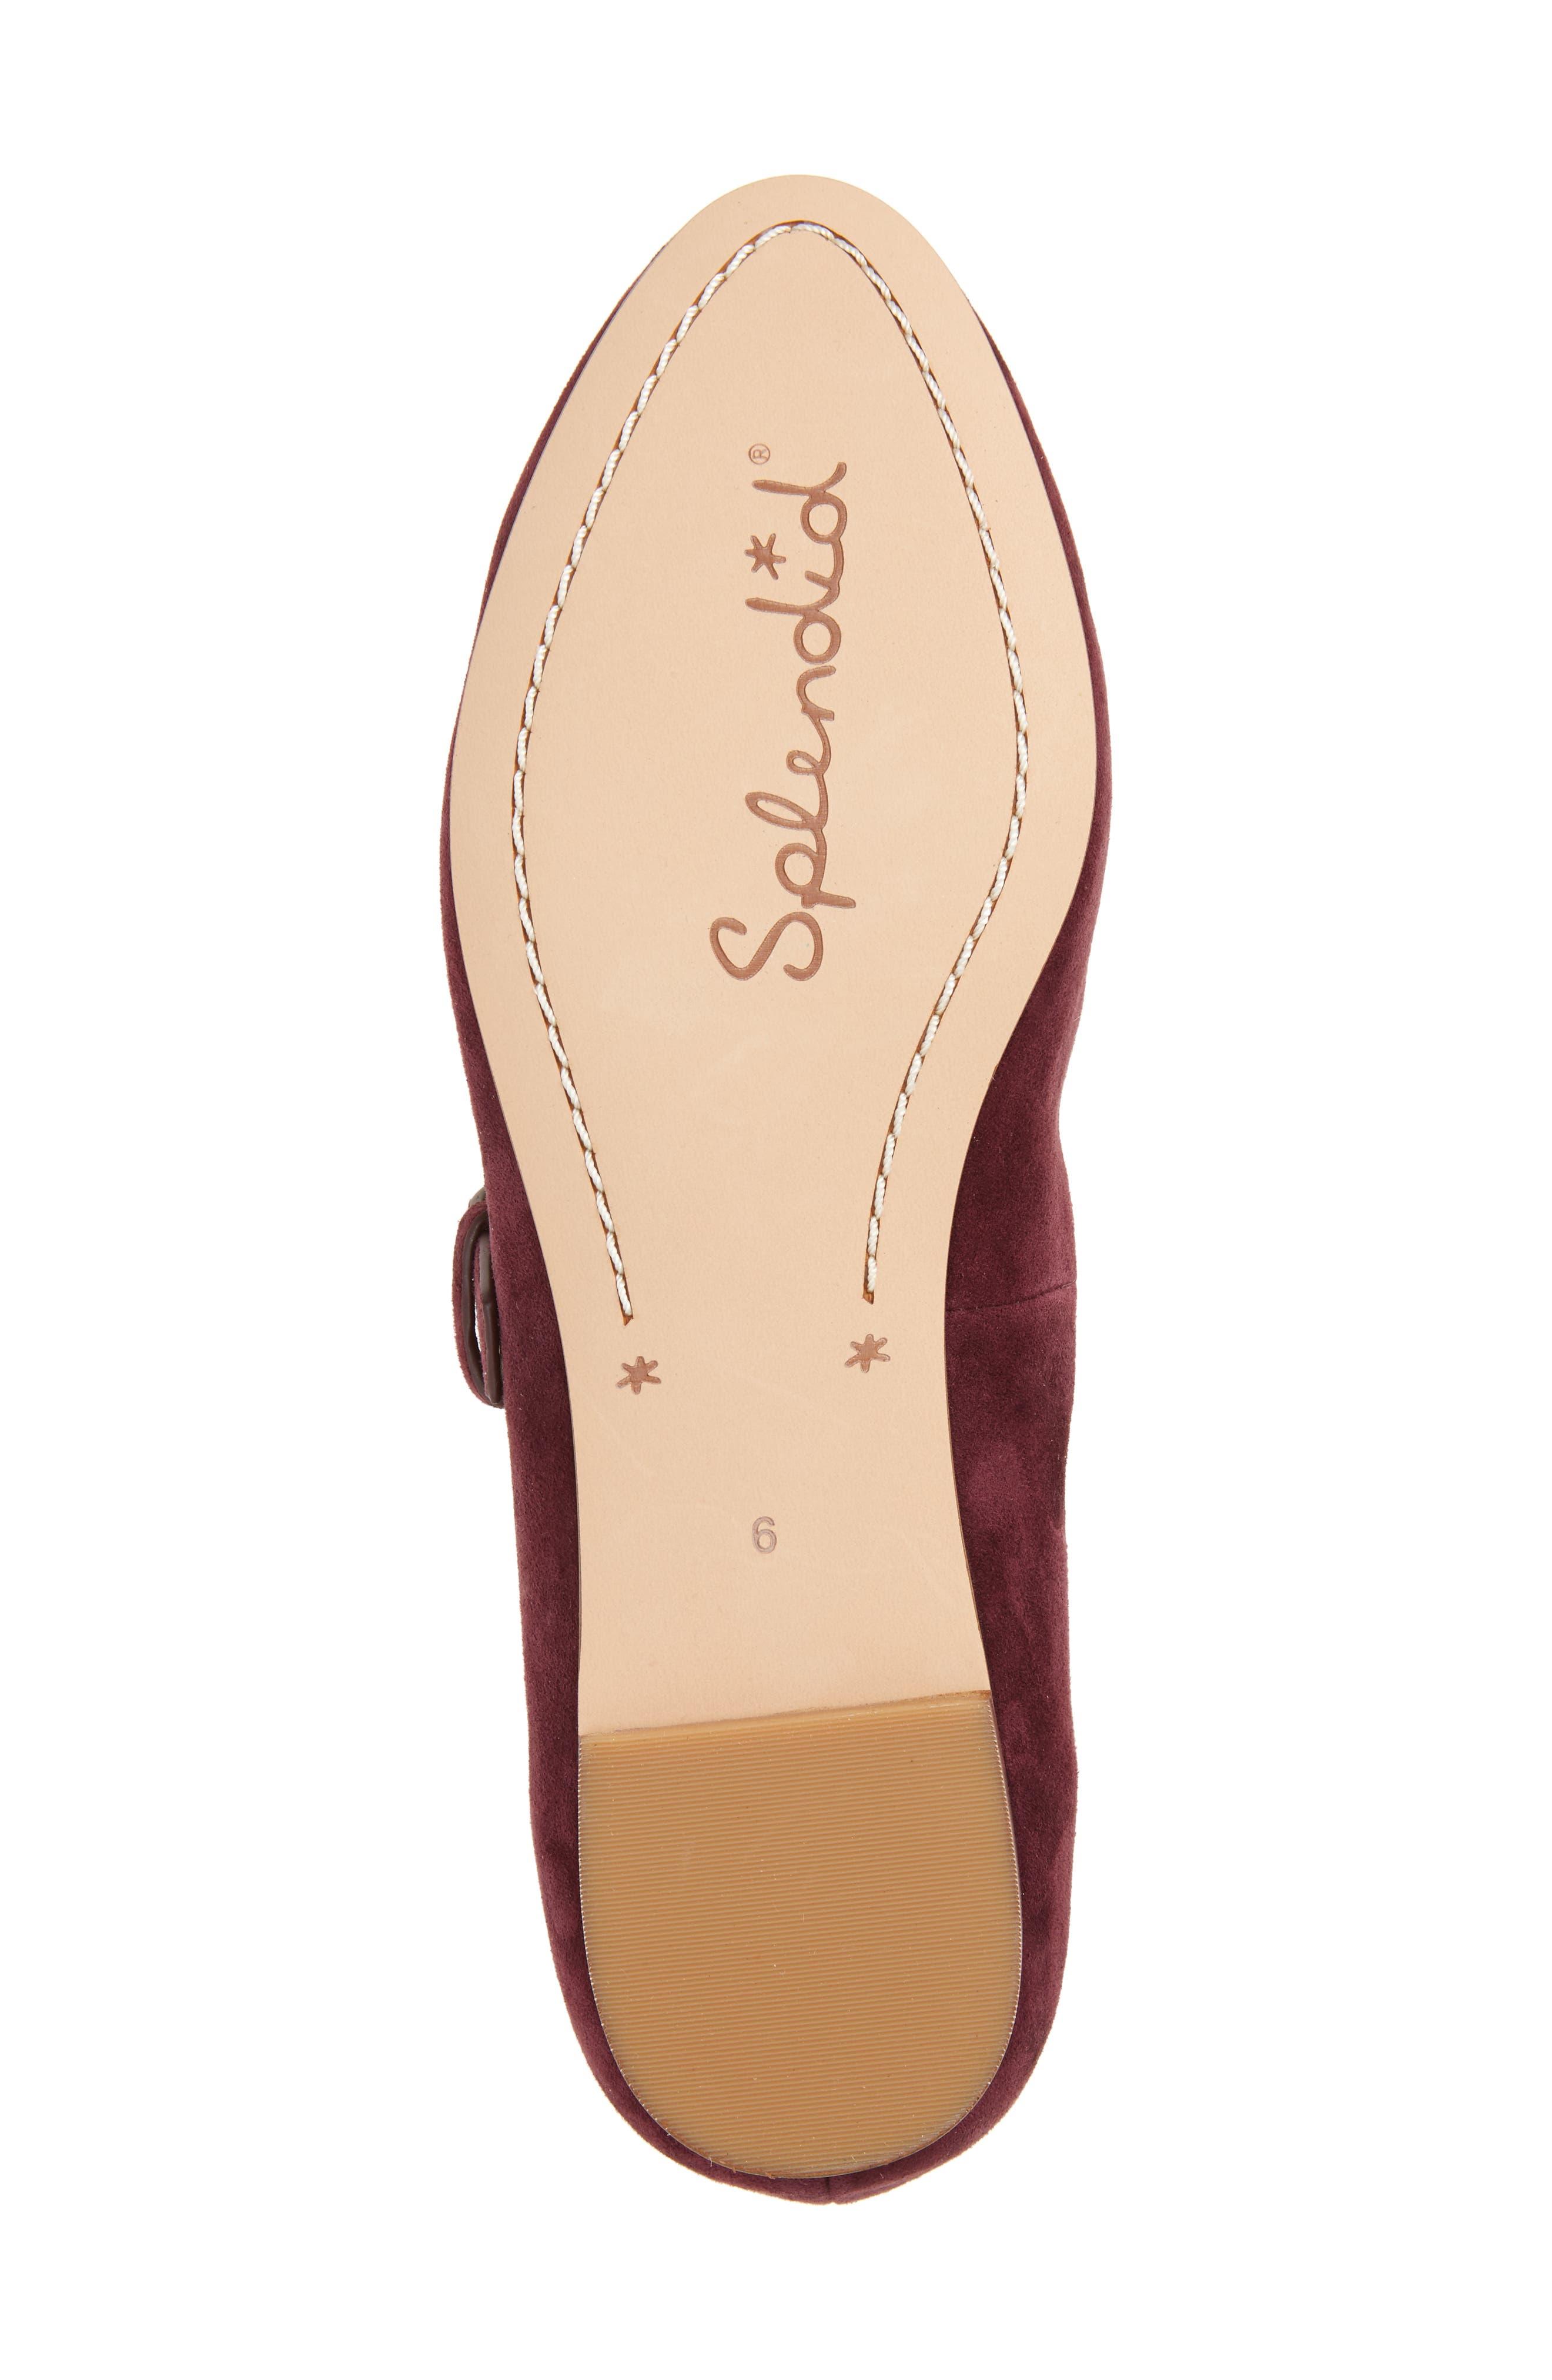 Dalenna Ankle Strap Ballet Flat,                             Alternate thumbnail 6, color,                             Wine Suede